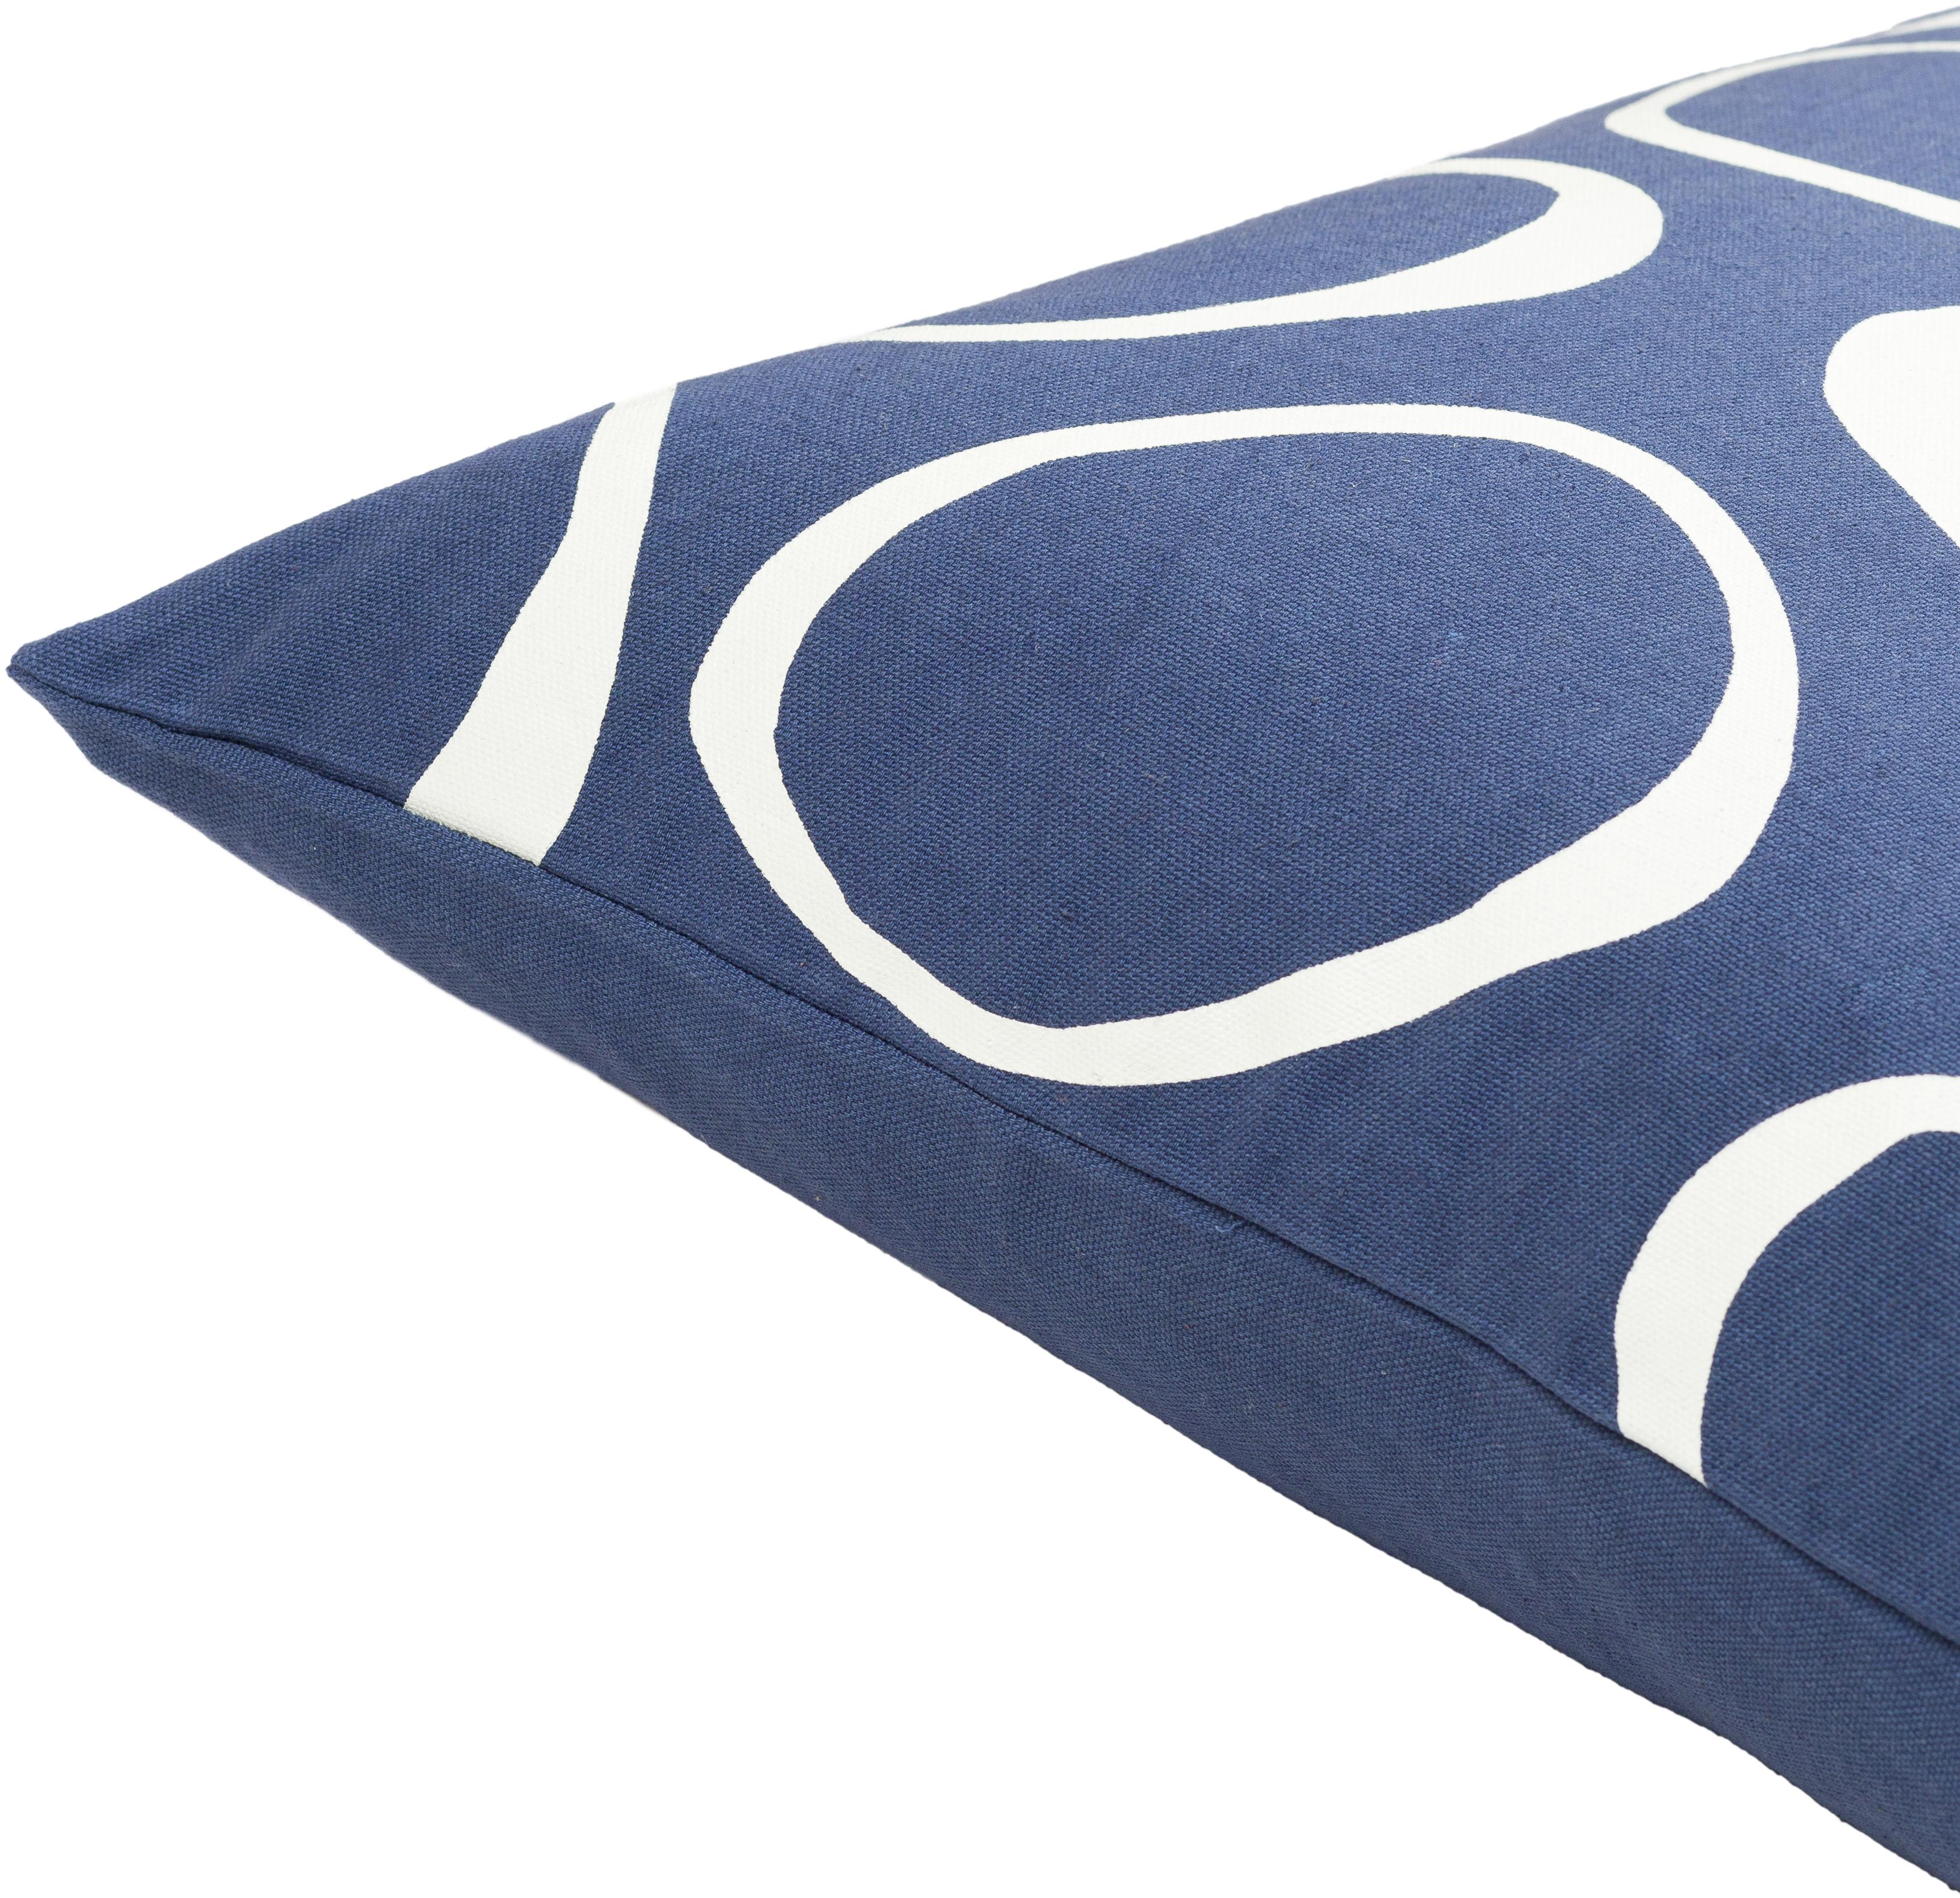 "Lachen - LHN-001 - 13""H x 20""W - pillow cover only"